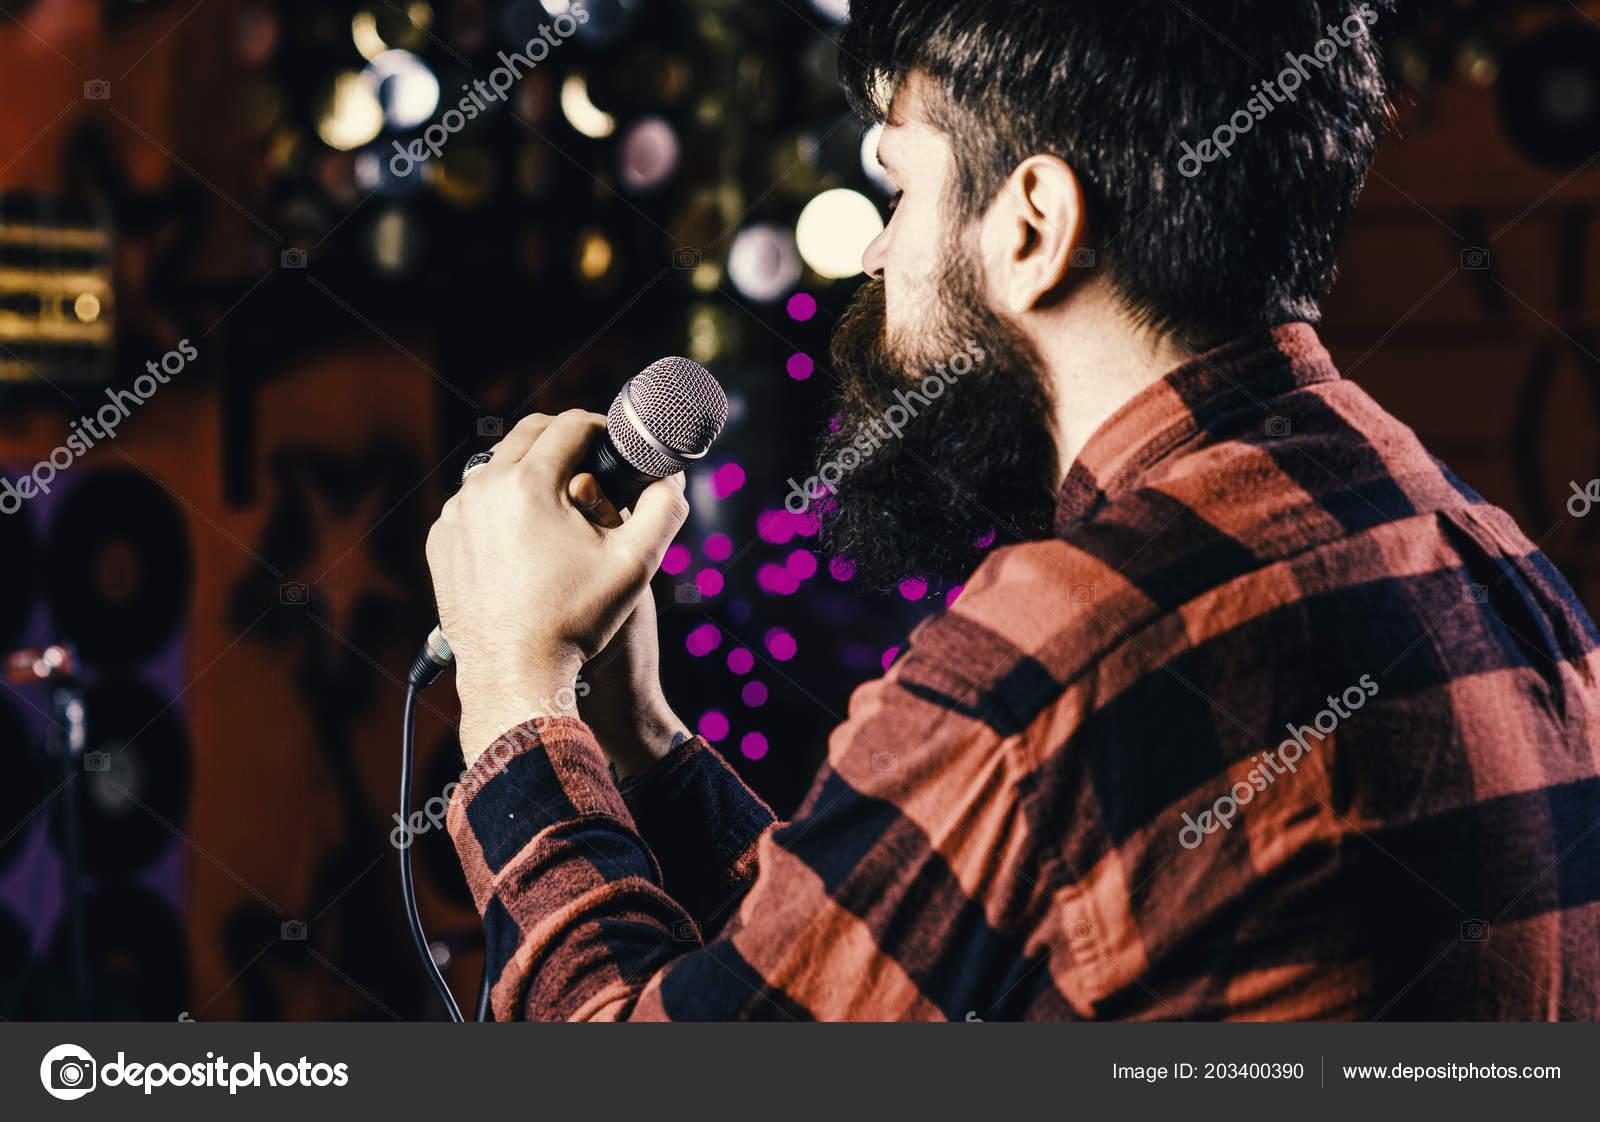 Musician with beard singing song in karaoke, rear view  Man in